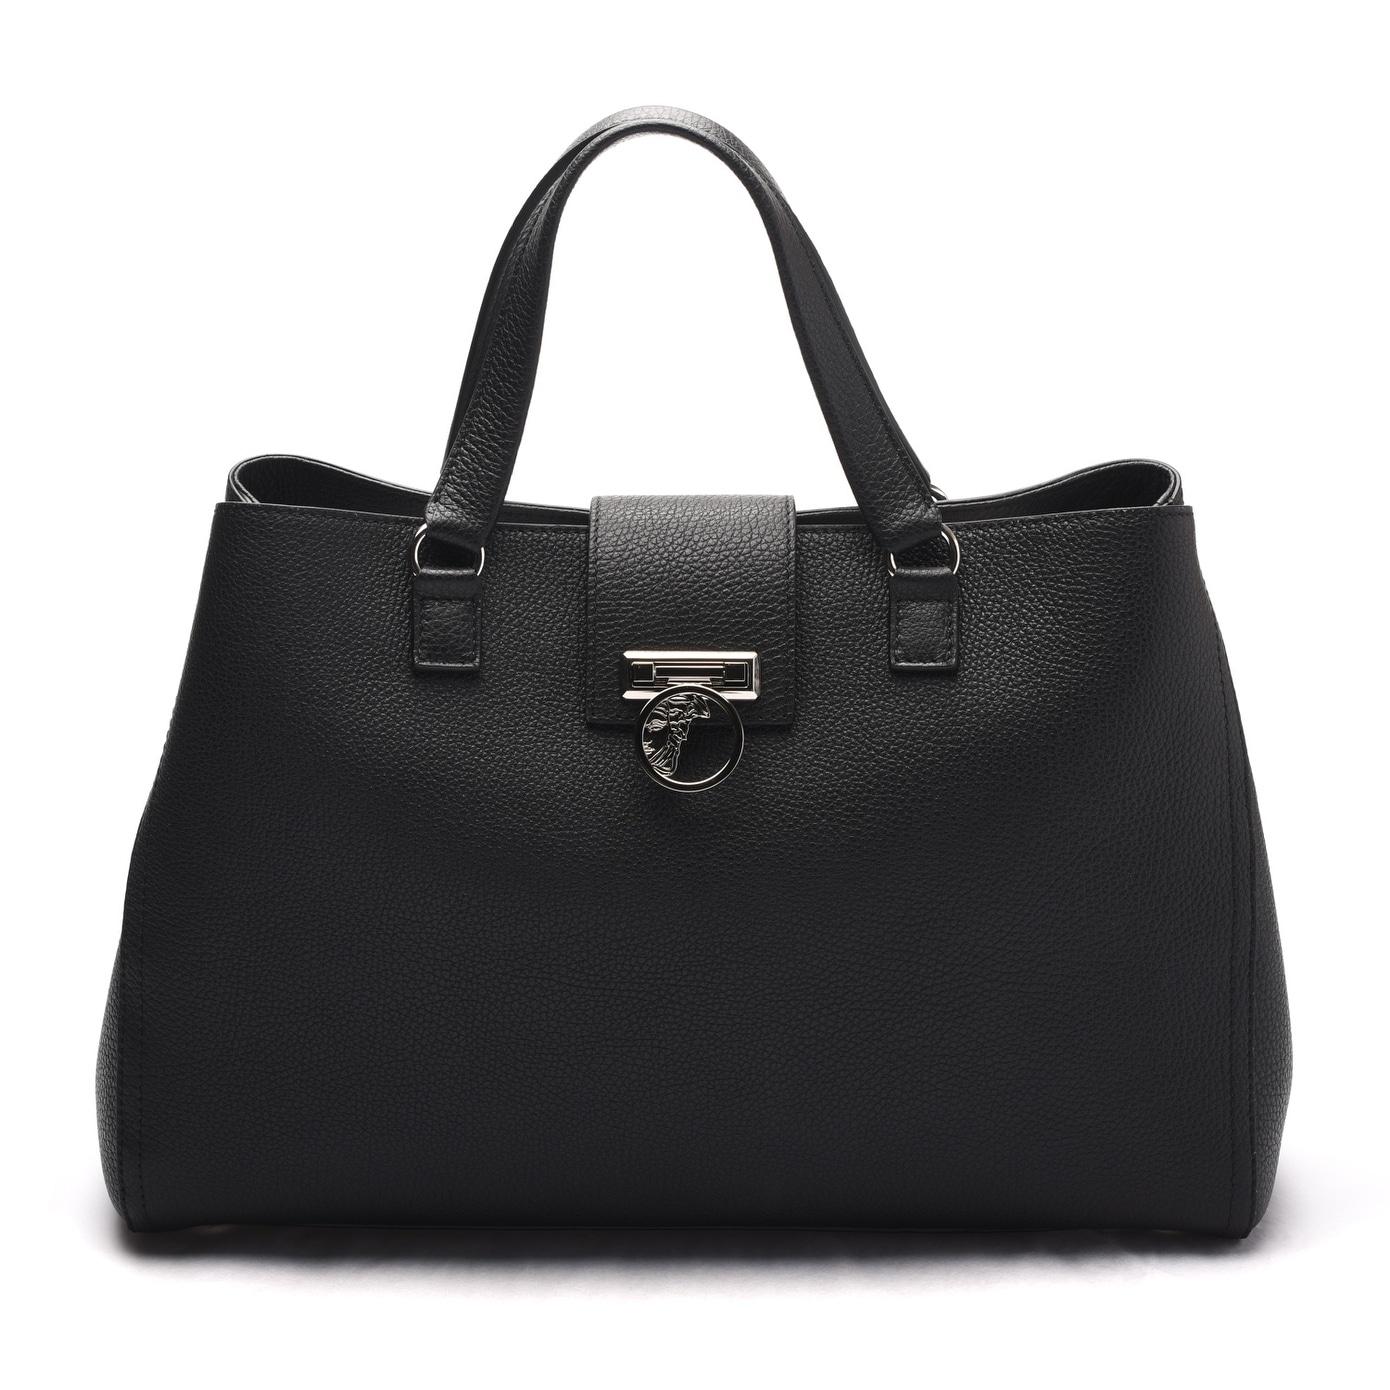 Versace Collection Women Pebbled Leather Medusa Top Handle Handbag Satchel Black - M - Thumbnail 0